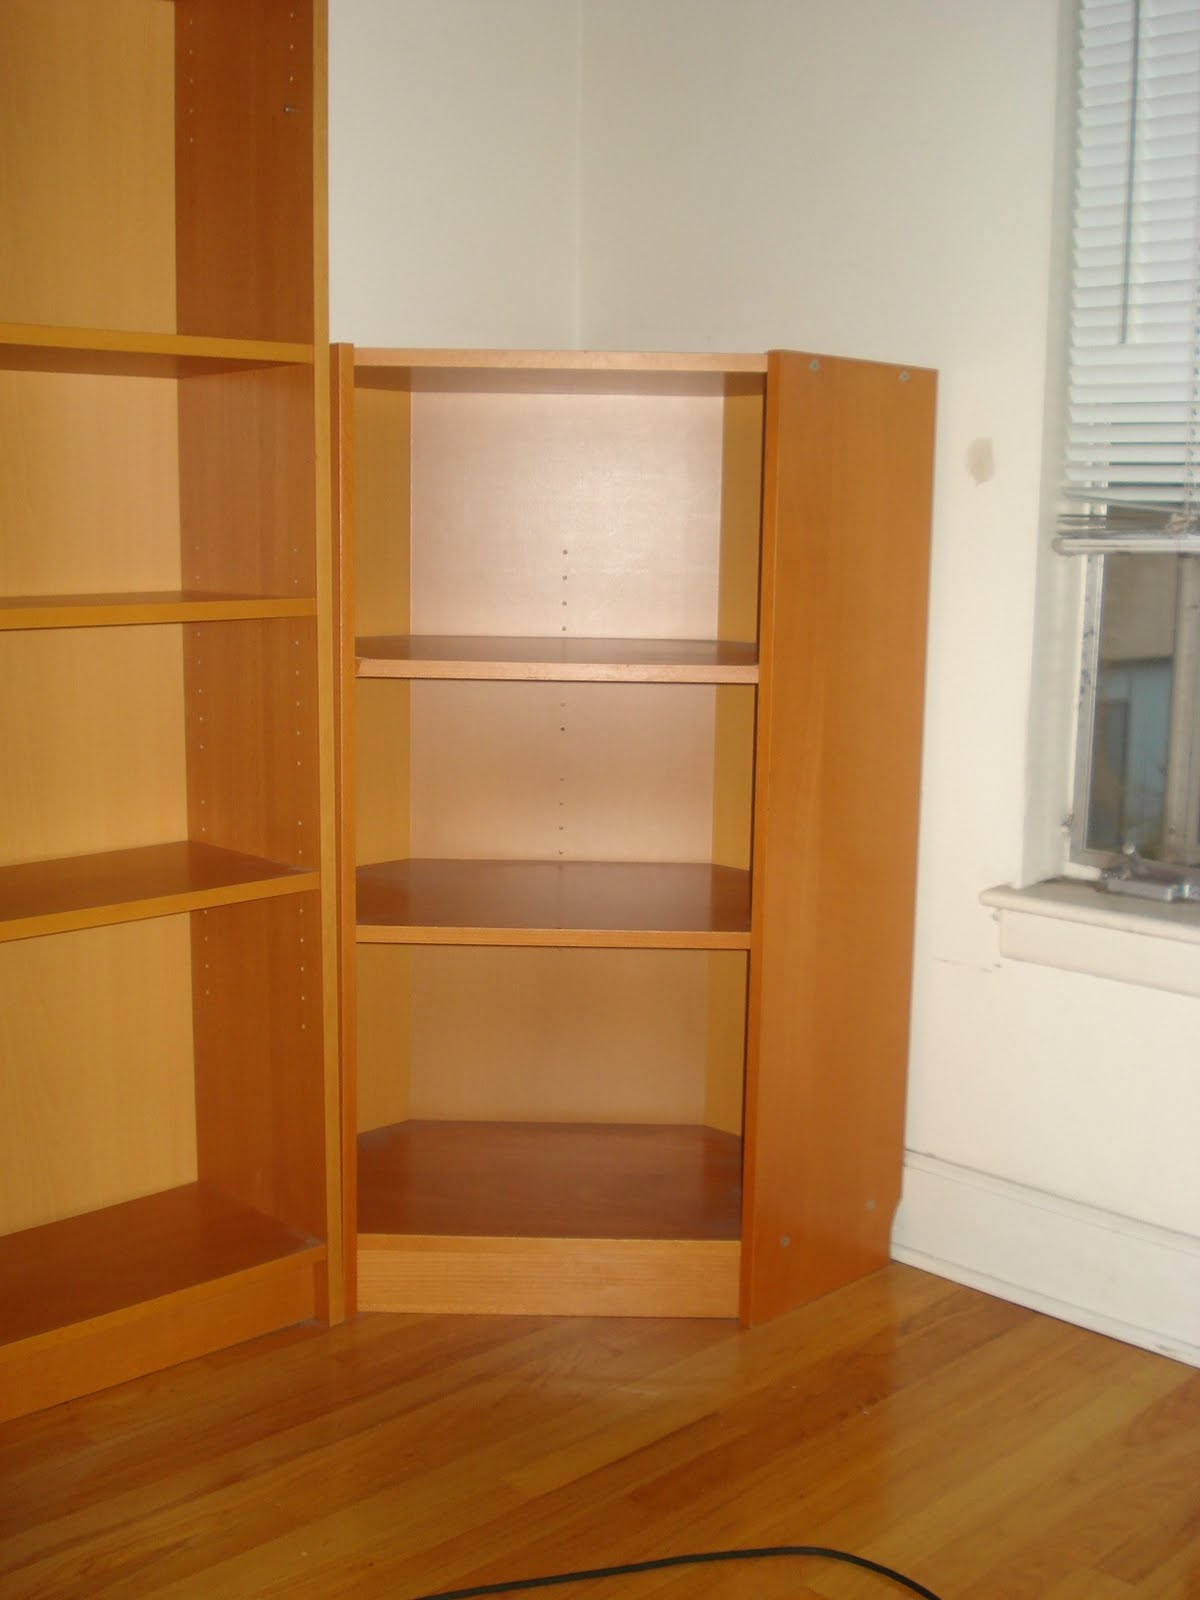 craig 39 s garage sale ikea corner bookcase